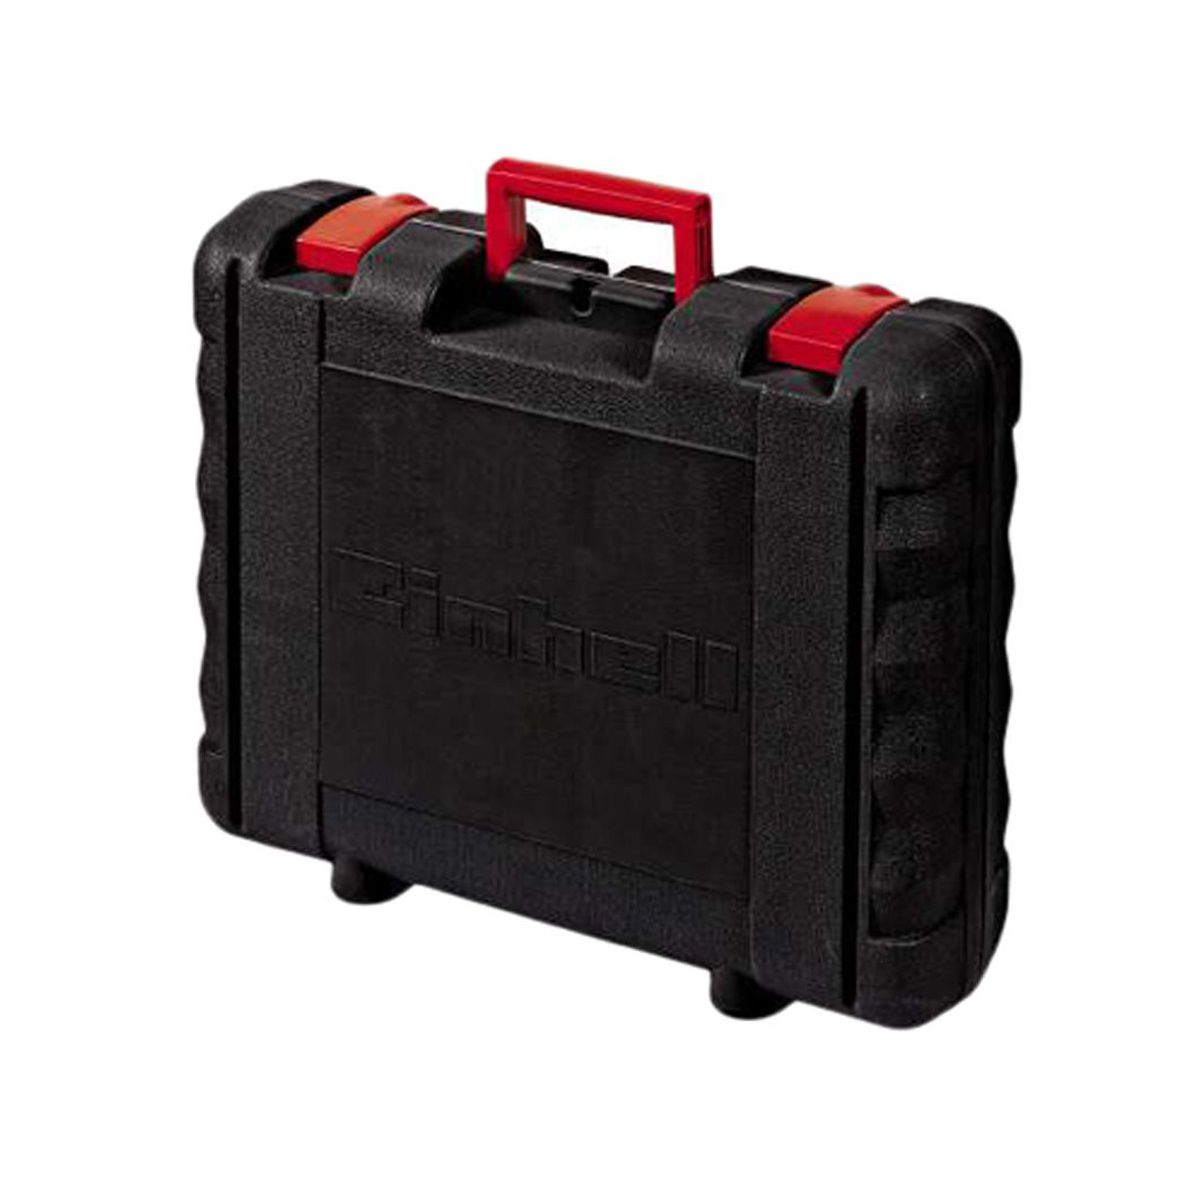 Furadeira De Impacto, Rt-ld 65 Red, 127v – Einhell